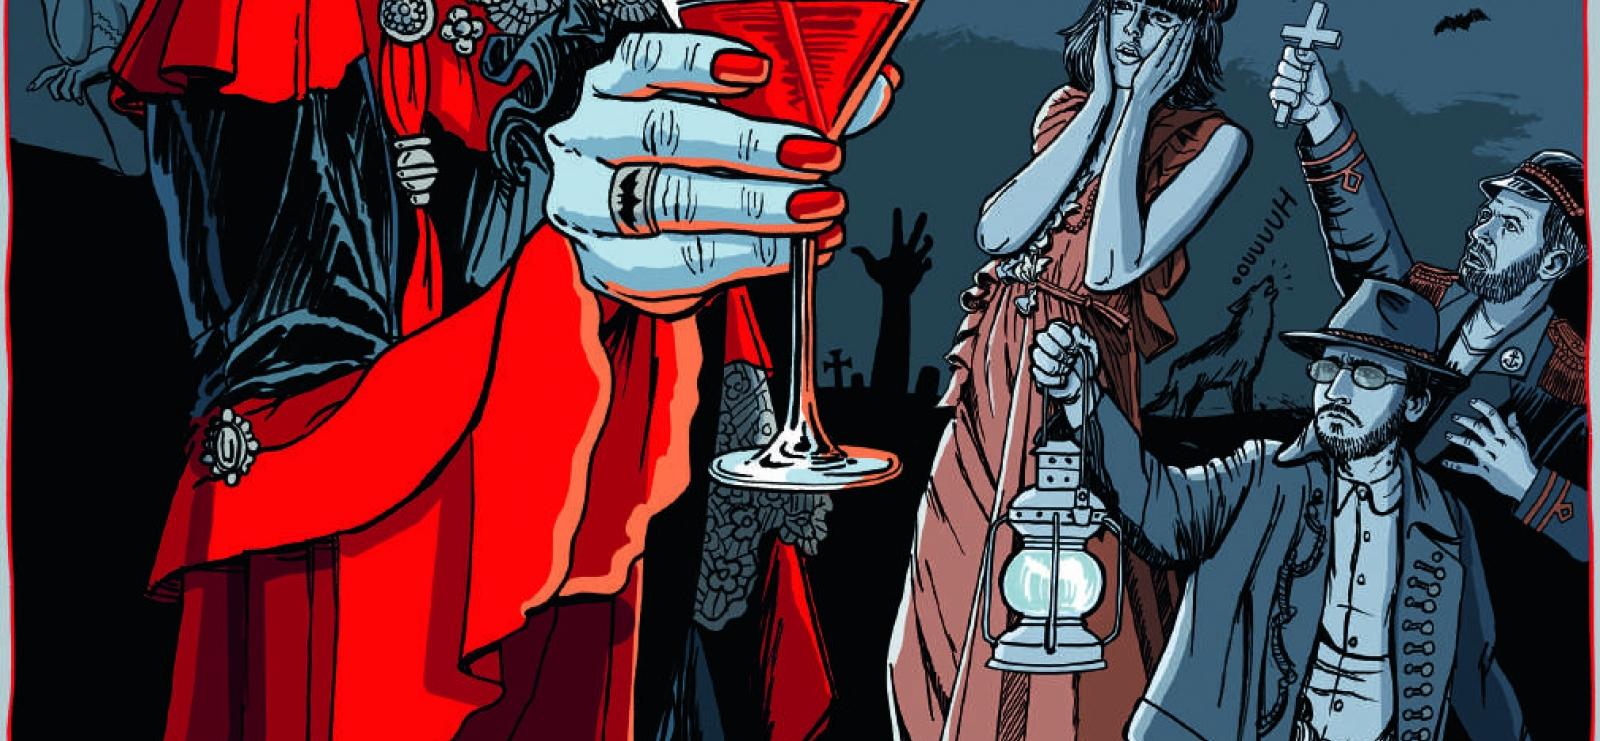 Spécial Halloween - La véritable histoire de Dracula